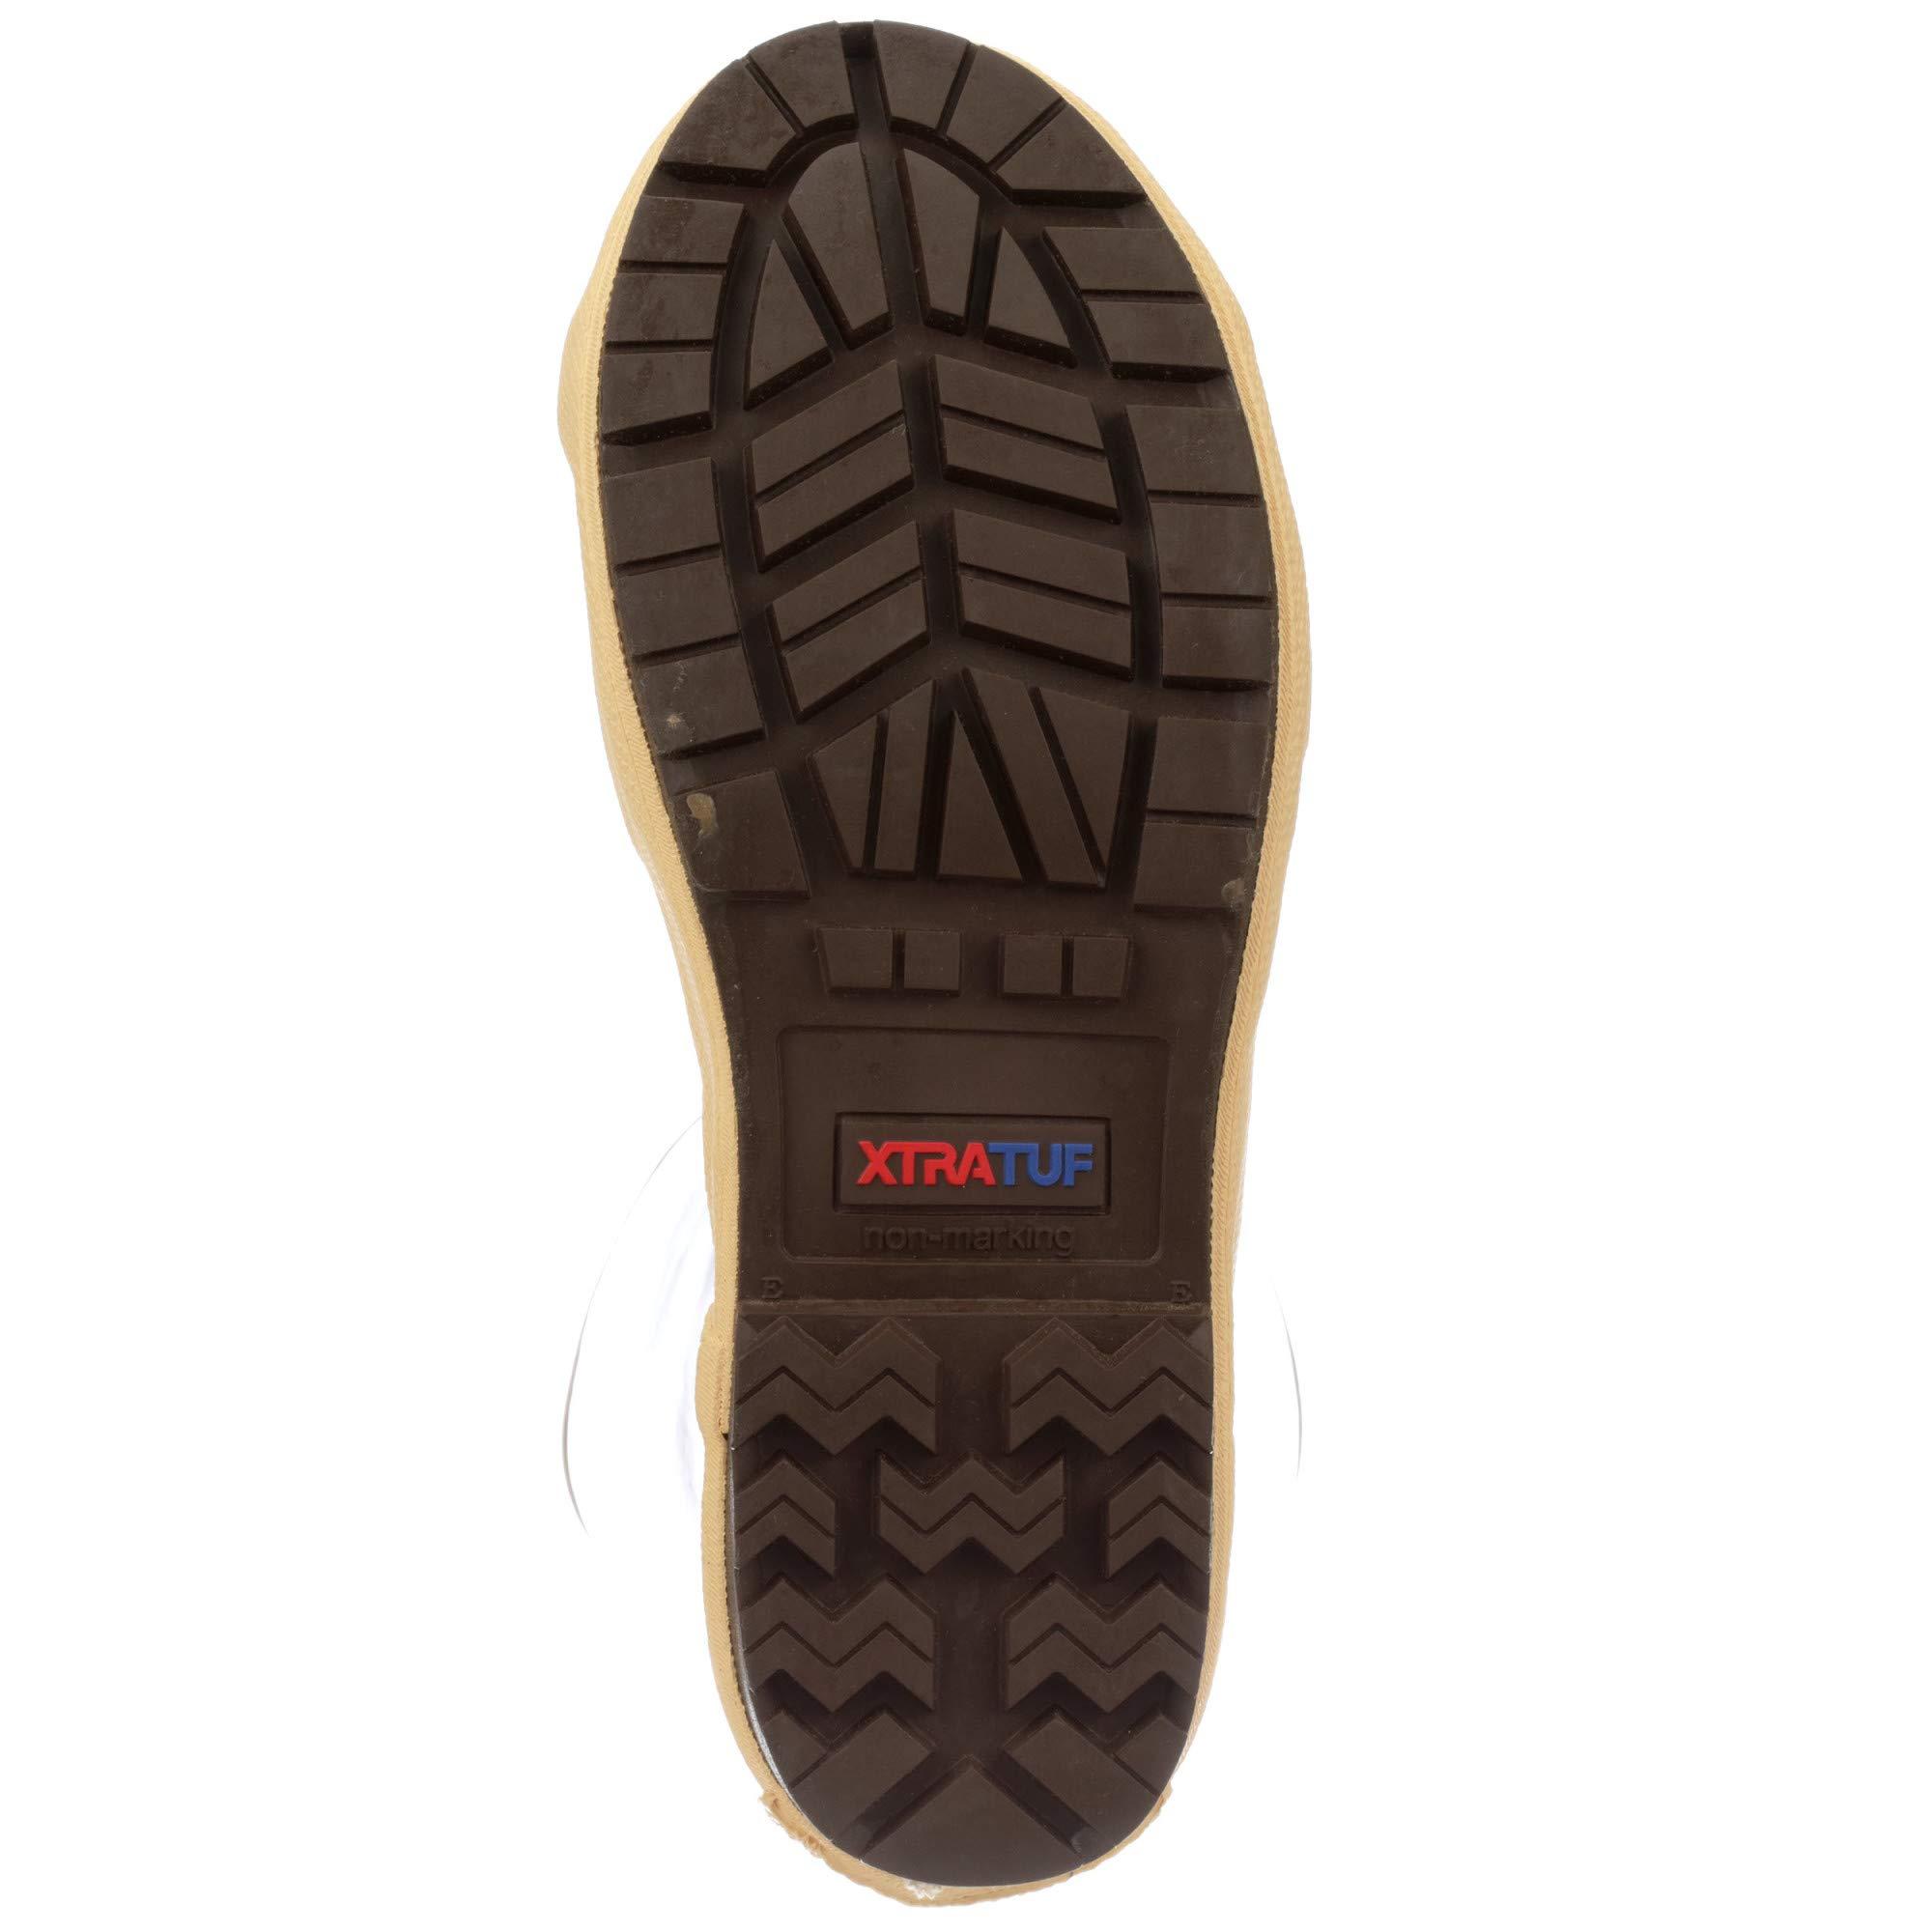 XTRATUF Legacy 2.0 Series 15'' Neoprene Composite Toe Men's Fishing Boots, Copper & Tan (22292G) by Xtratuf (Image #2)